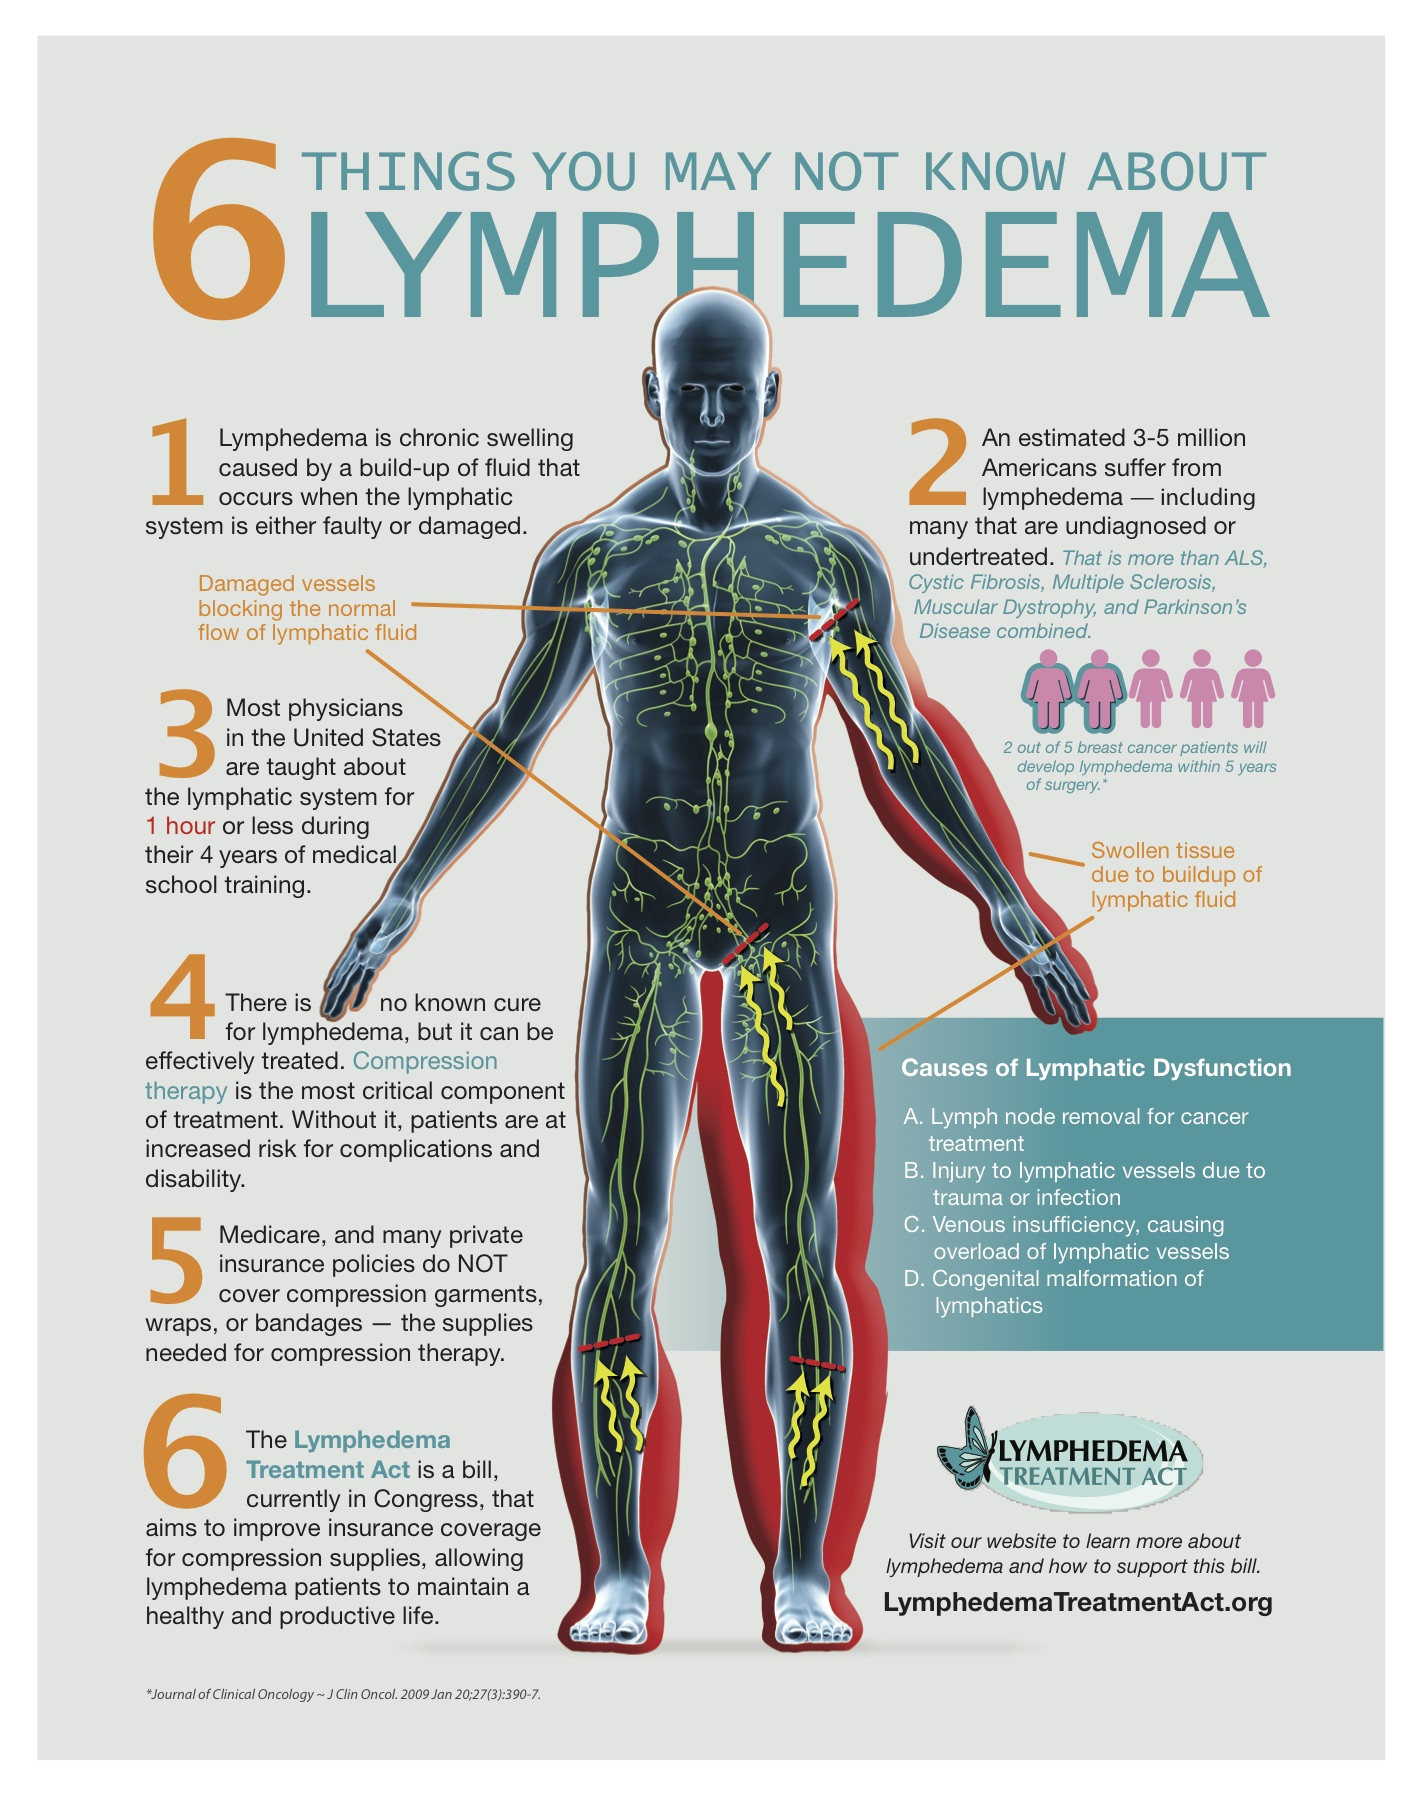 Wat ass Lymhedema? | Gesondheet Life Media